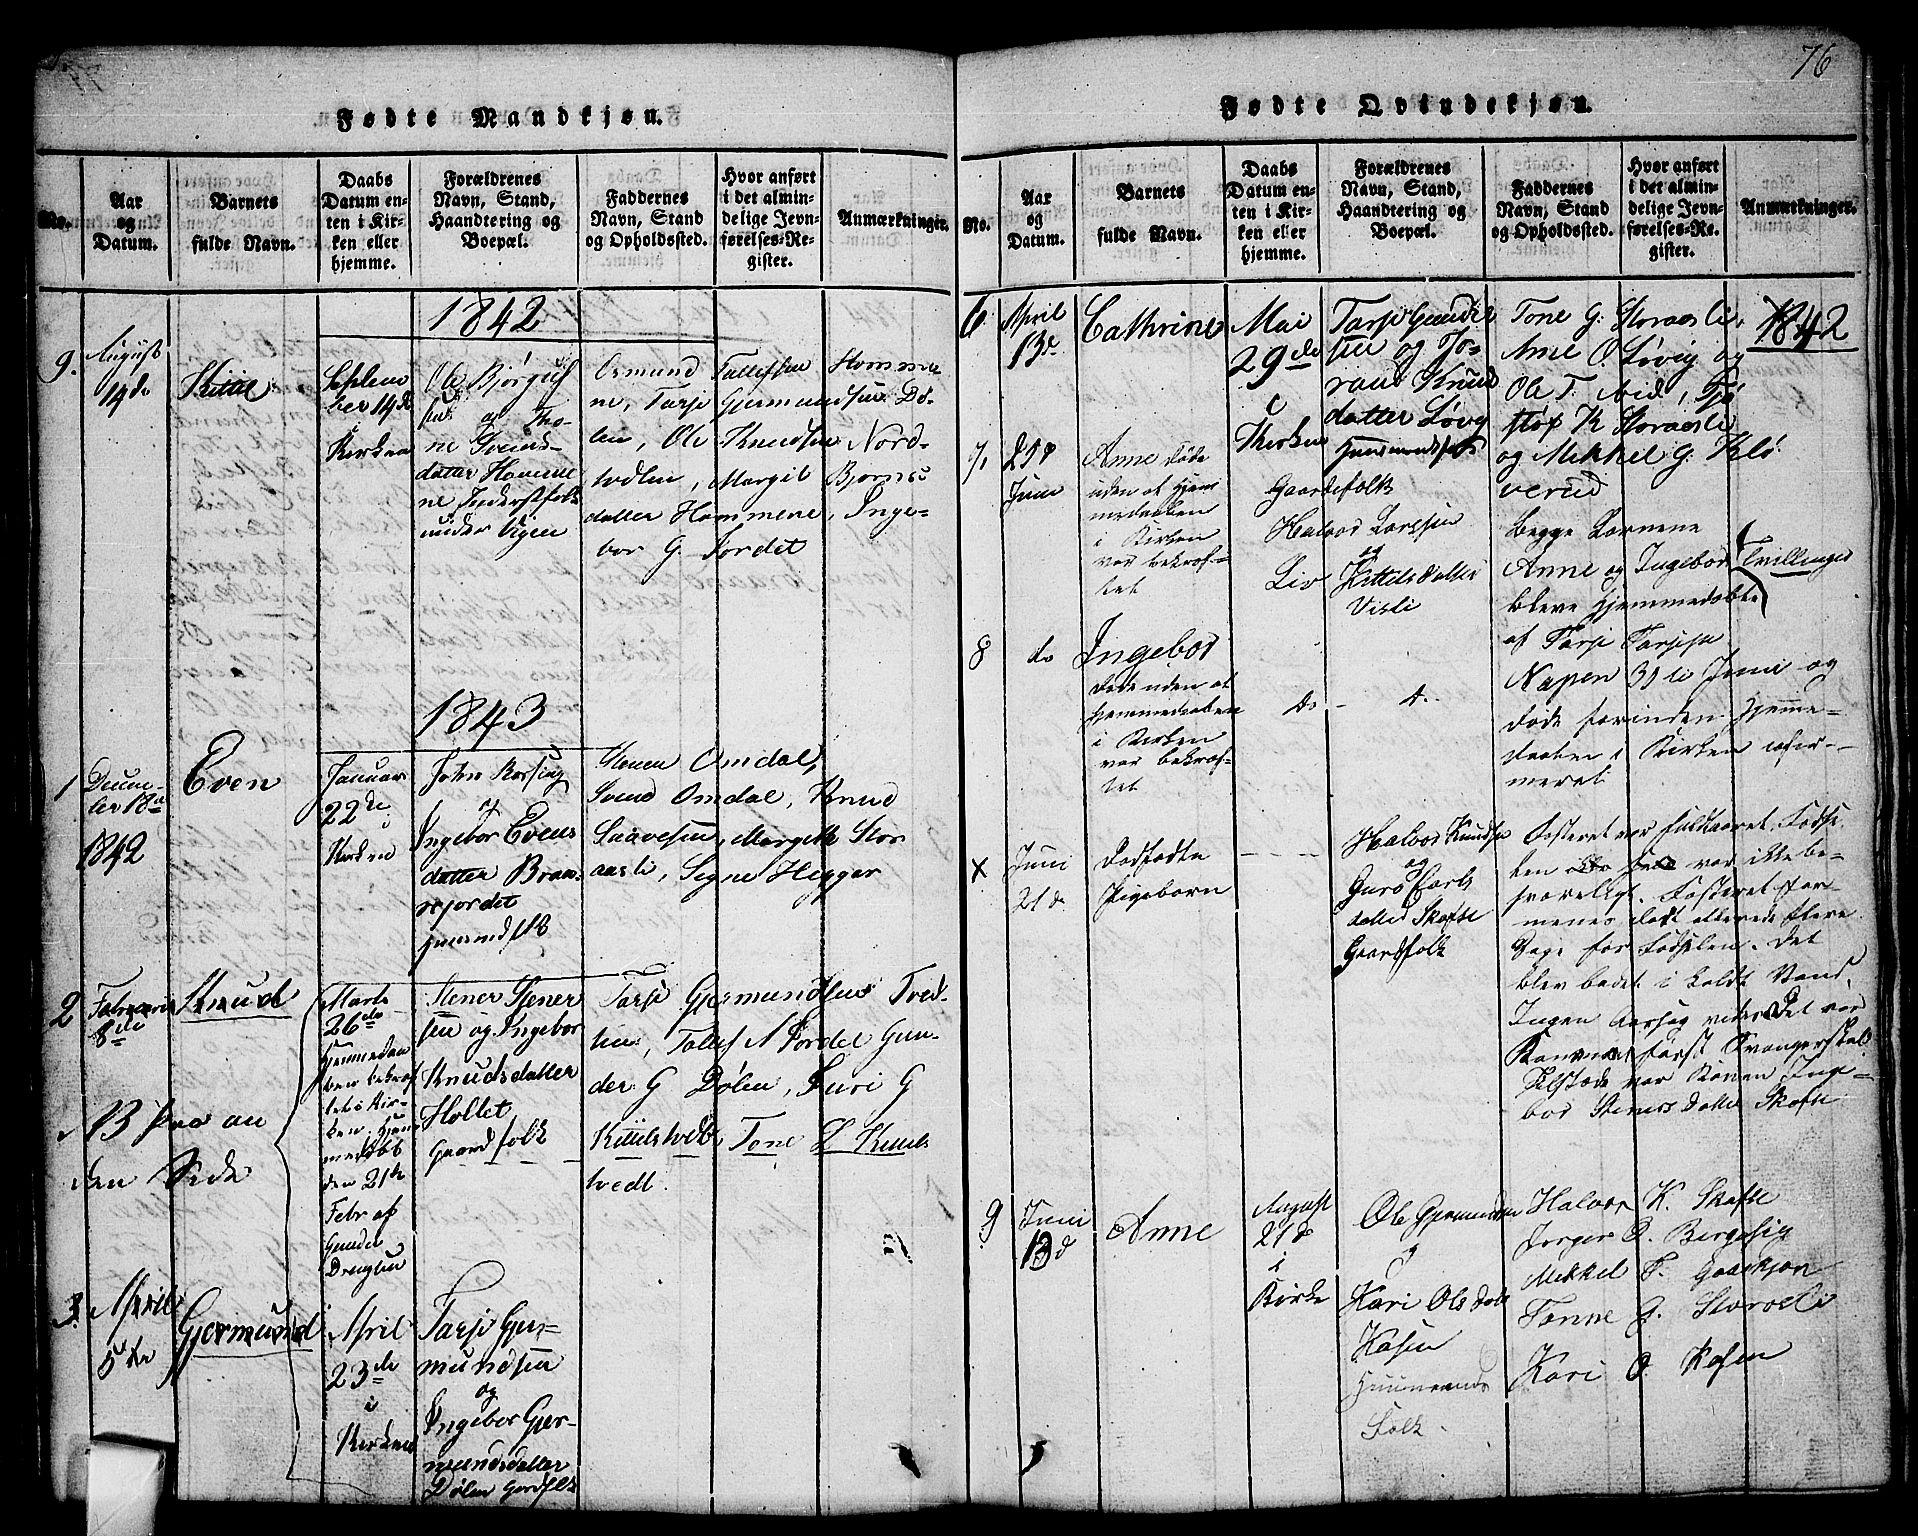 SAKO, Mo kirkebøker, G/Gb/L0001: Klokkerbok nr. II 1, 1814-1843, s. 76